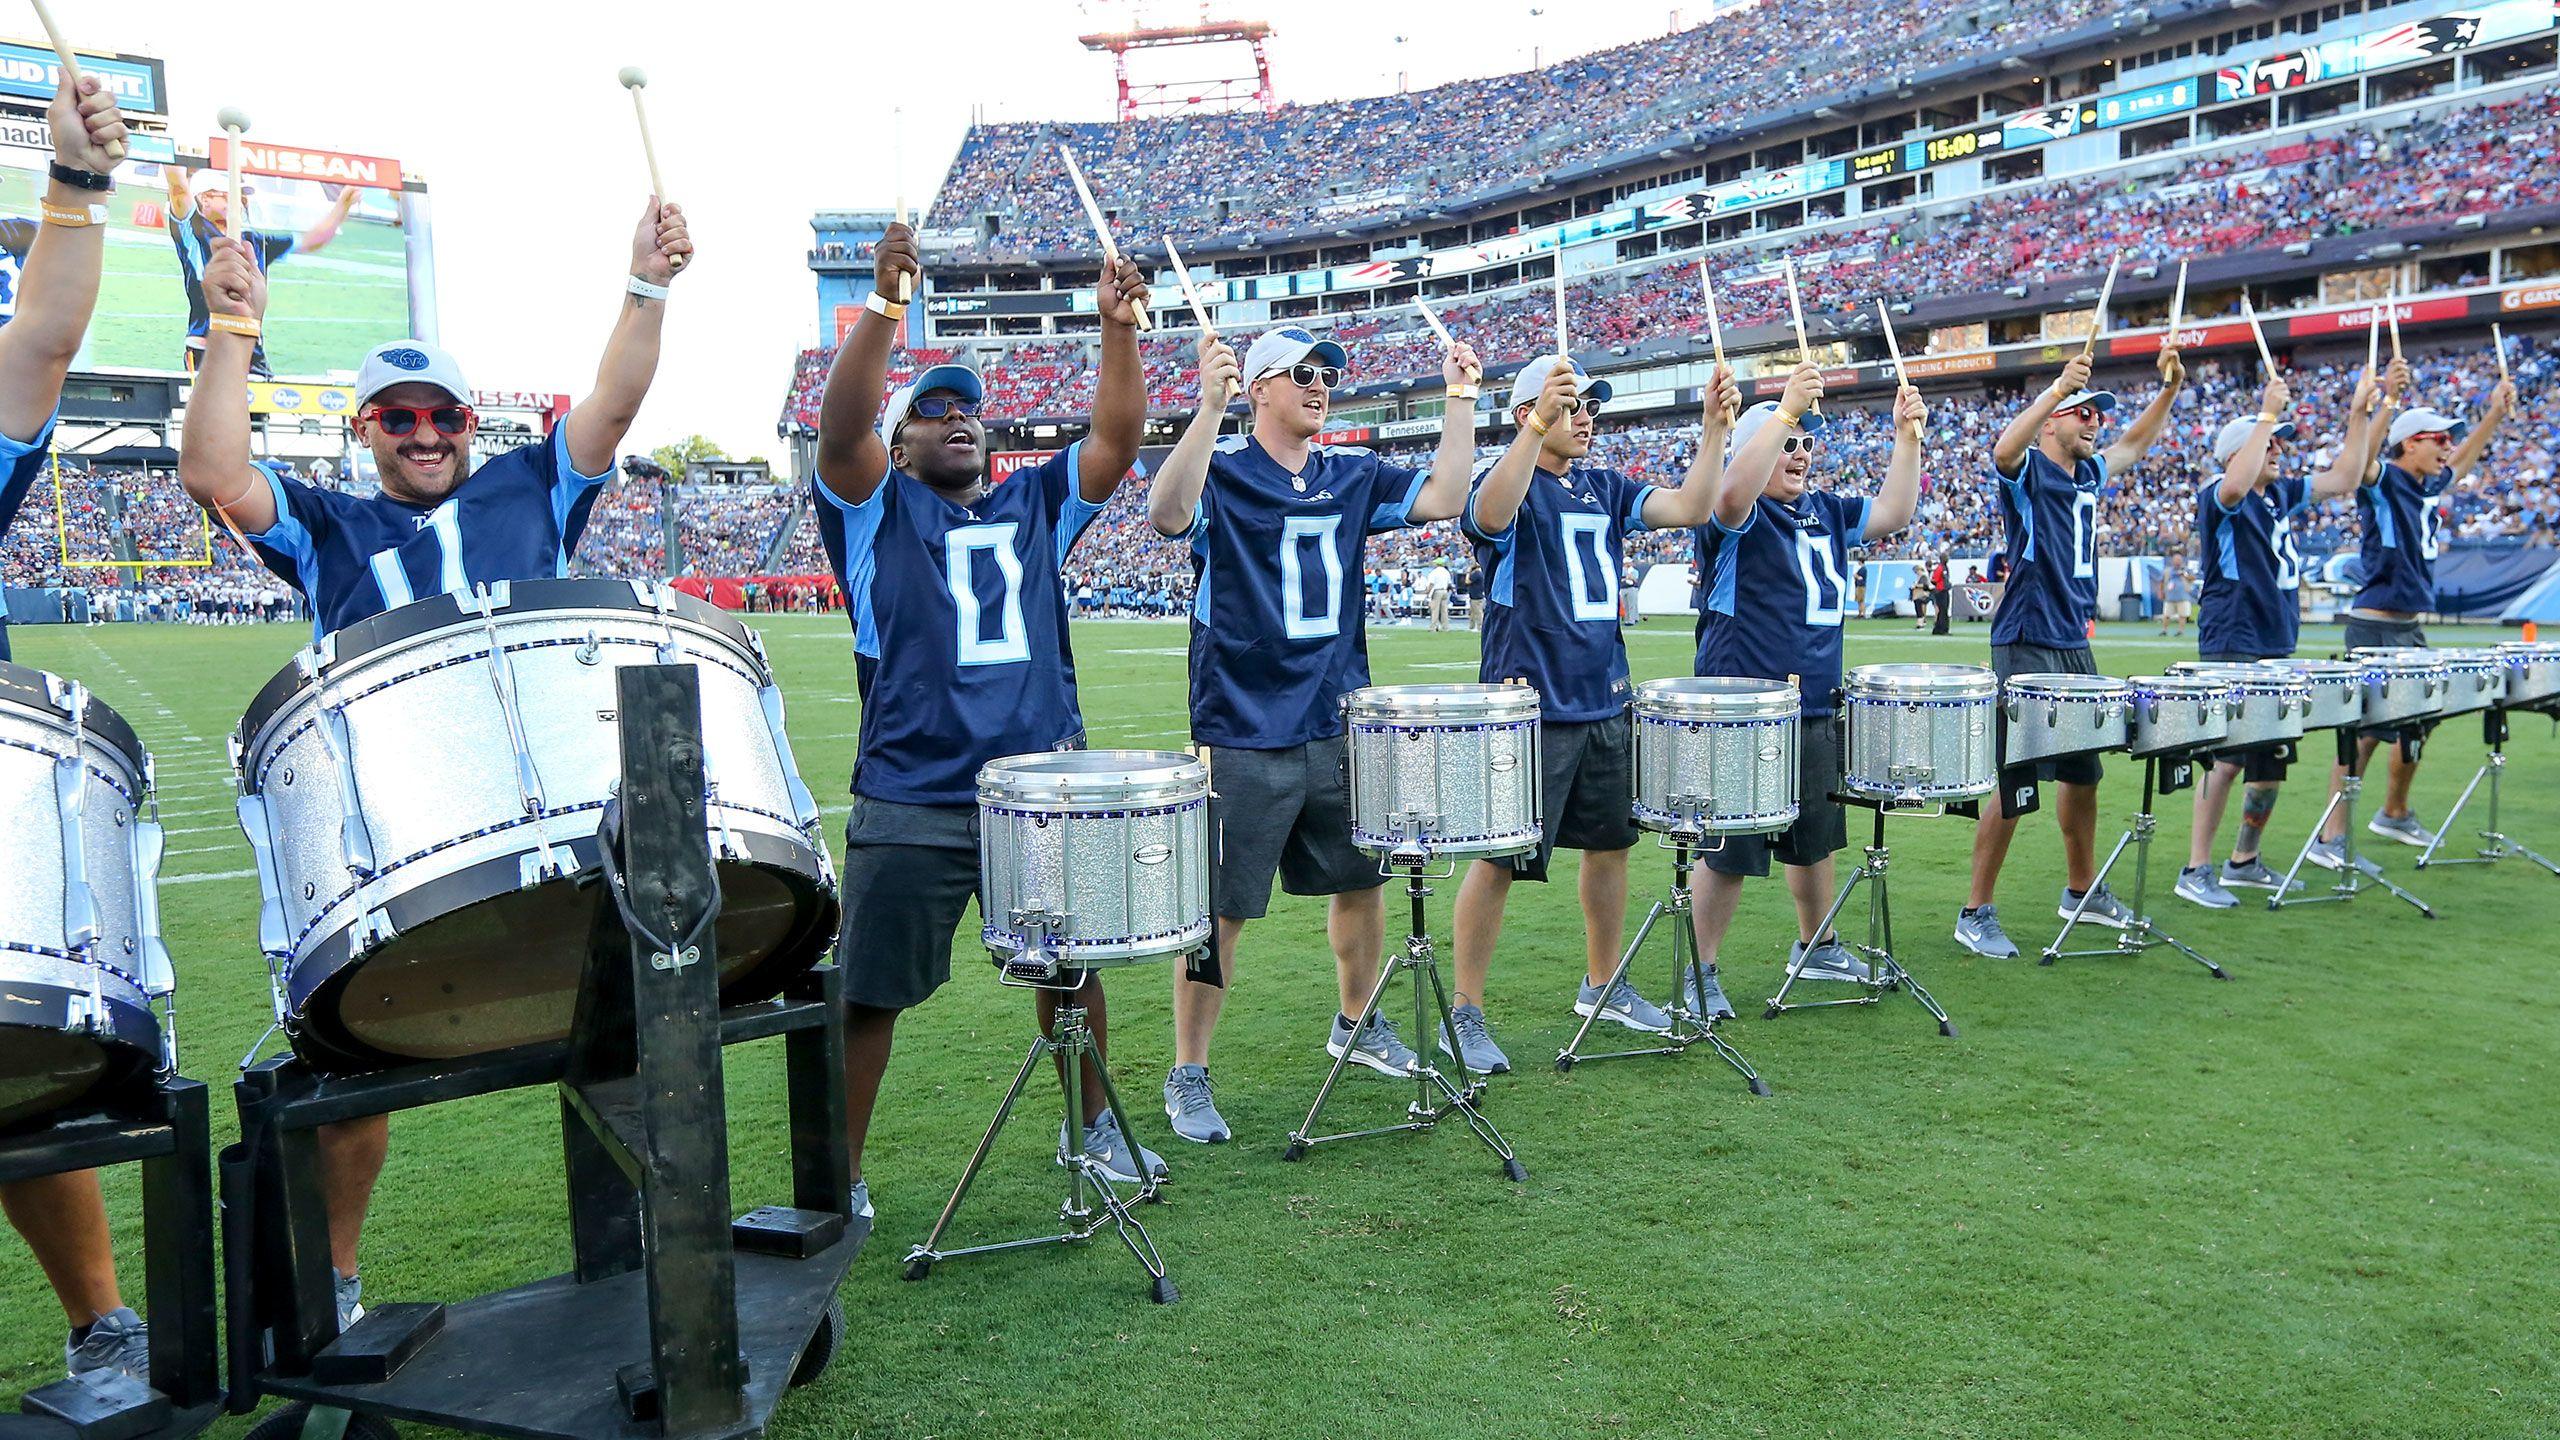 Blue Crew Drumline